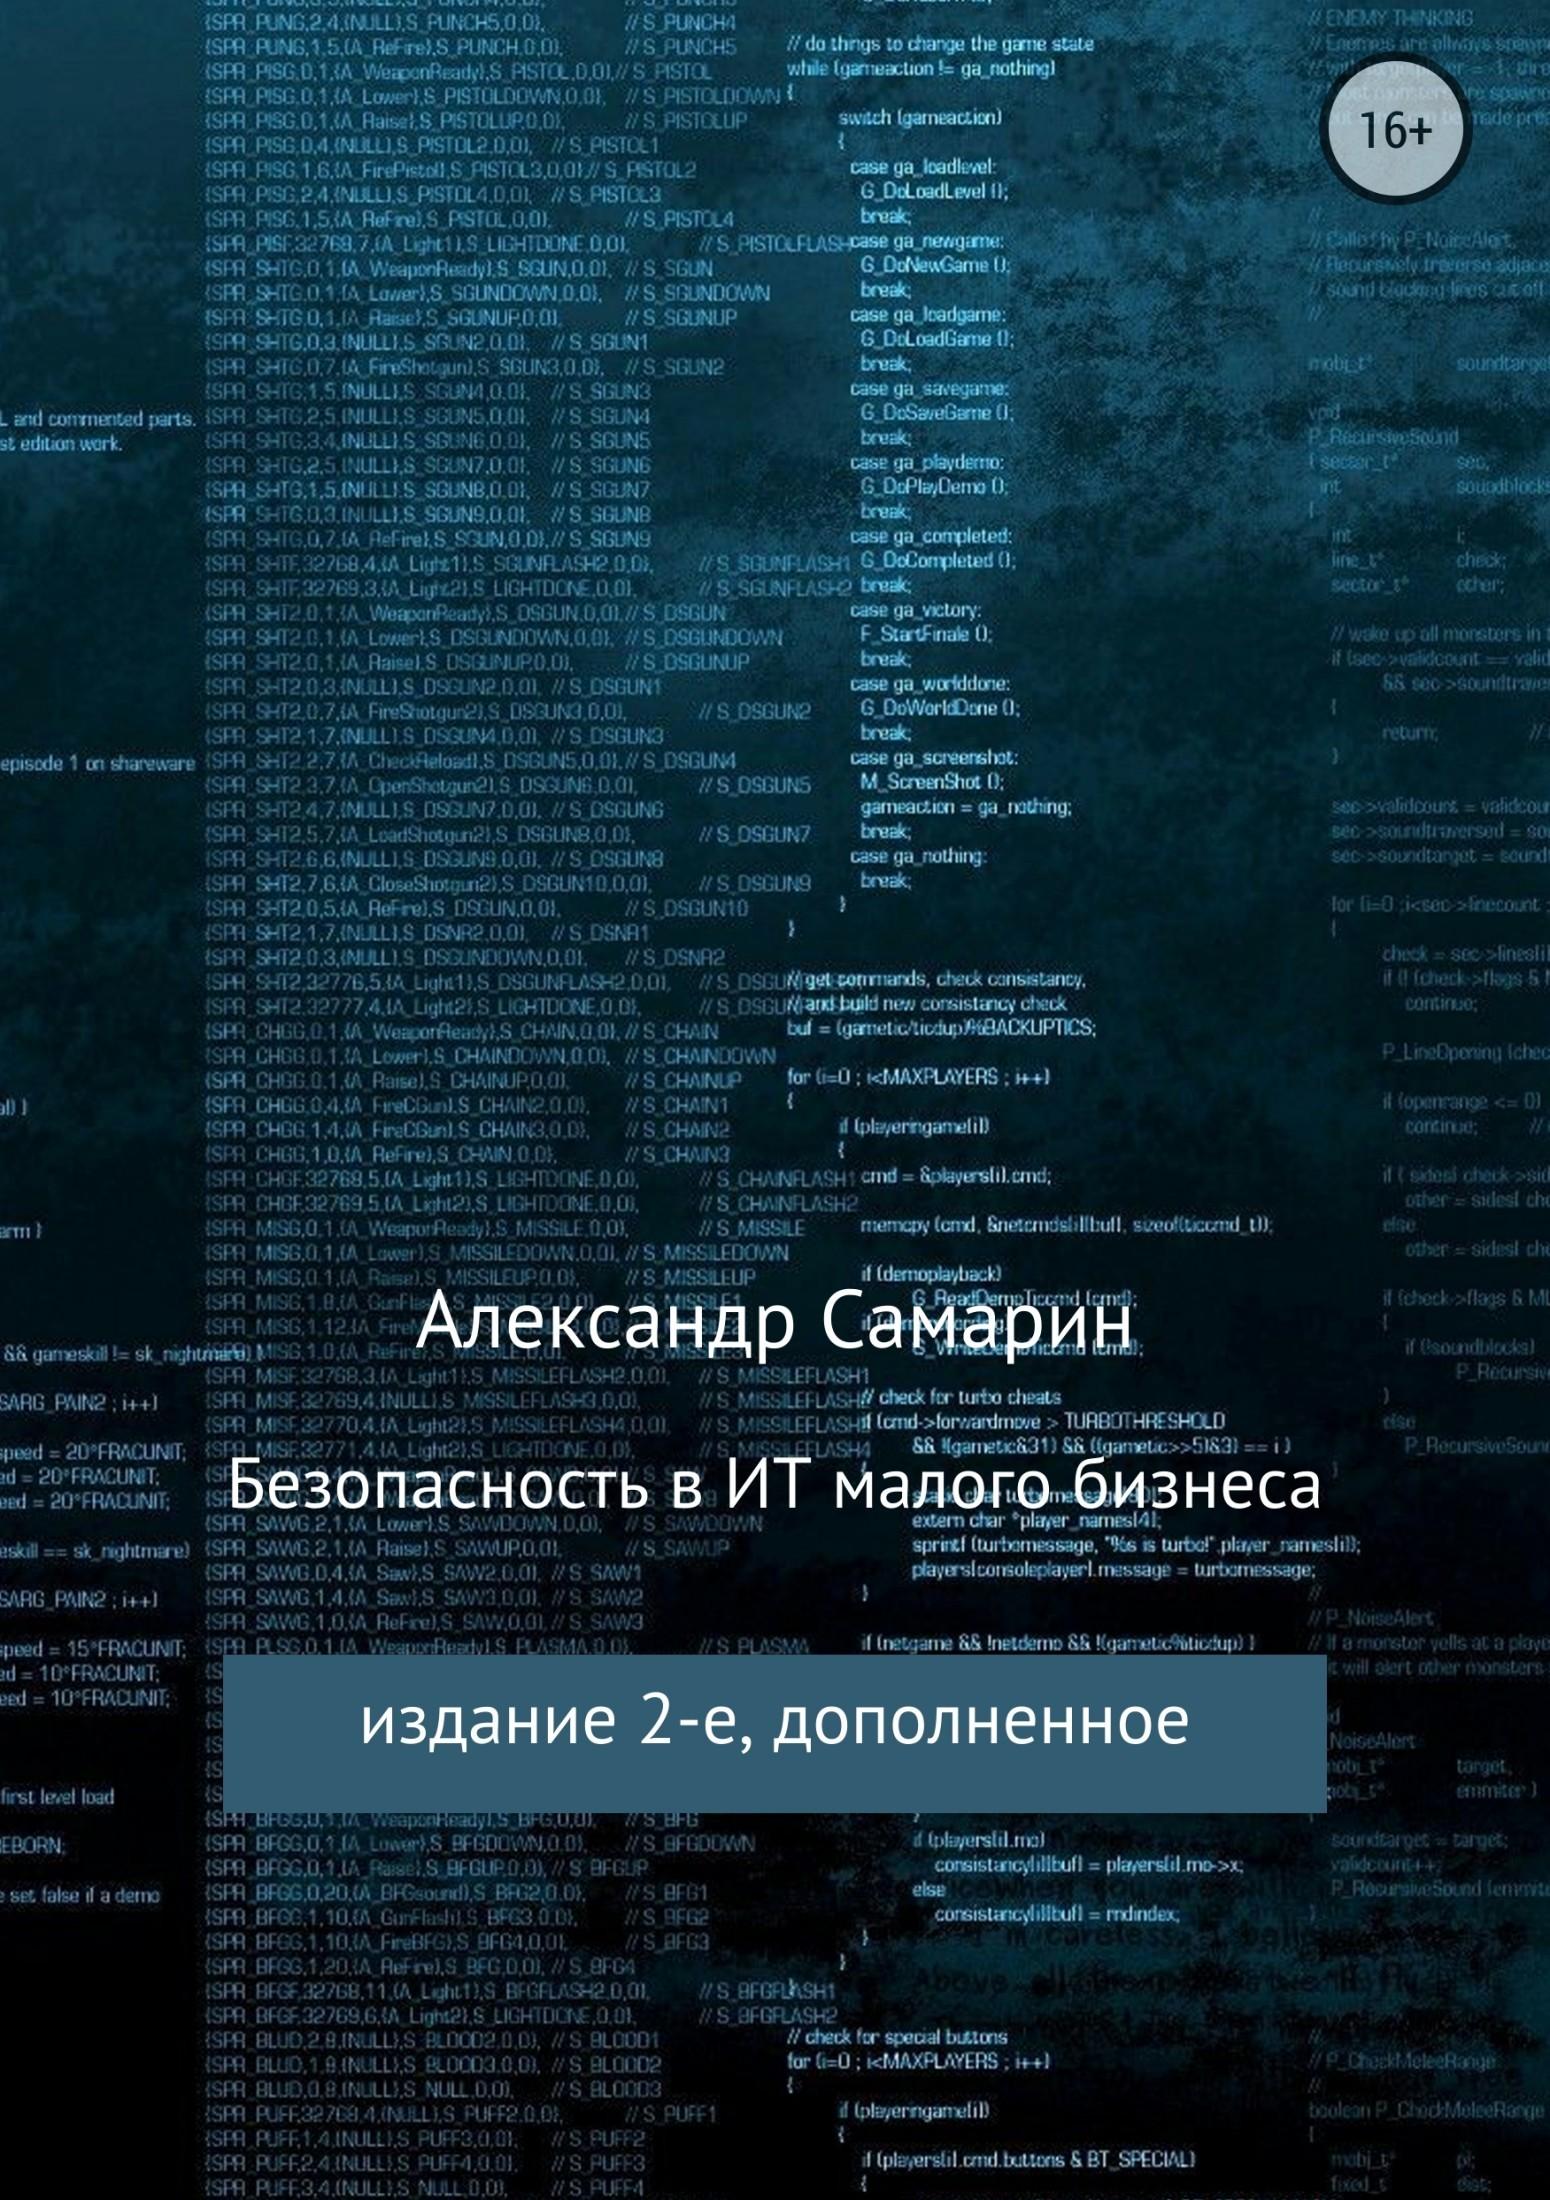 Обложка книги. Автор - Александр Самарин